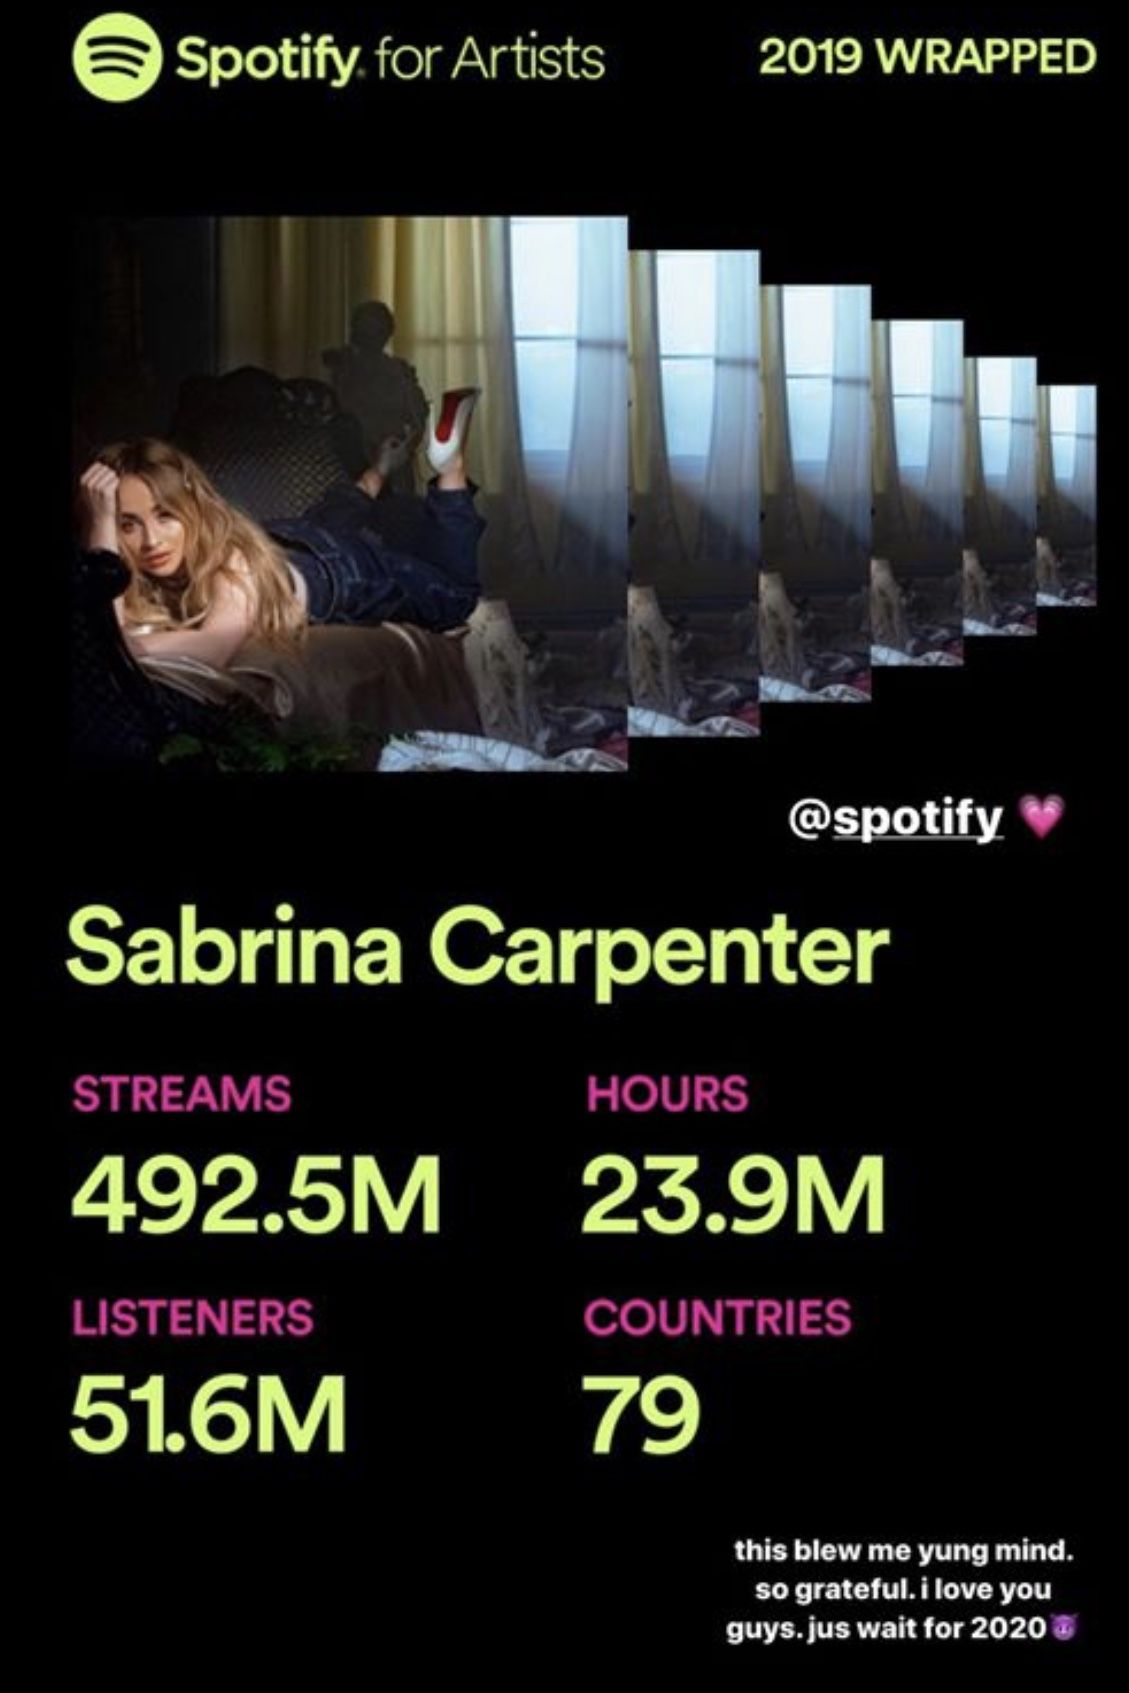 2019 Sabrina Carpenter statistics from Spotify Wrap